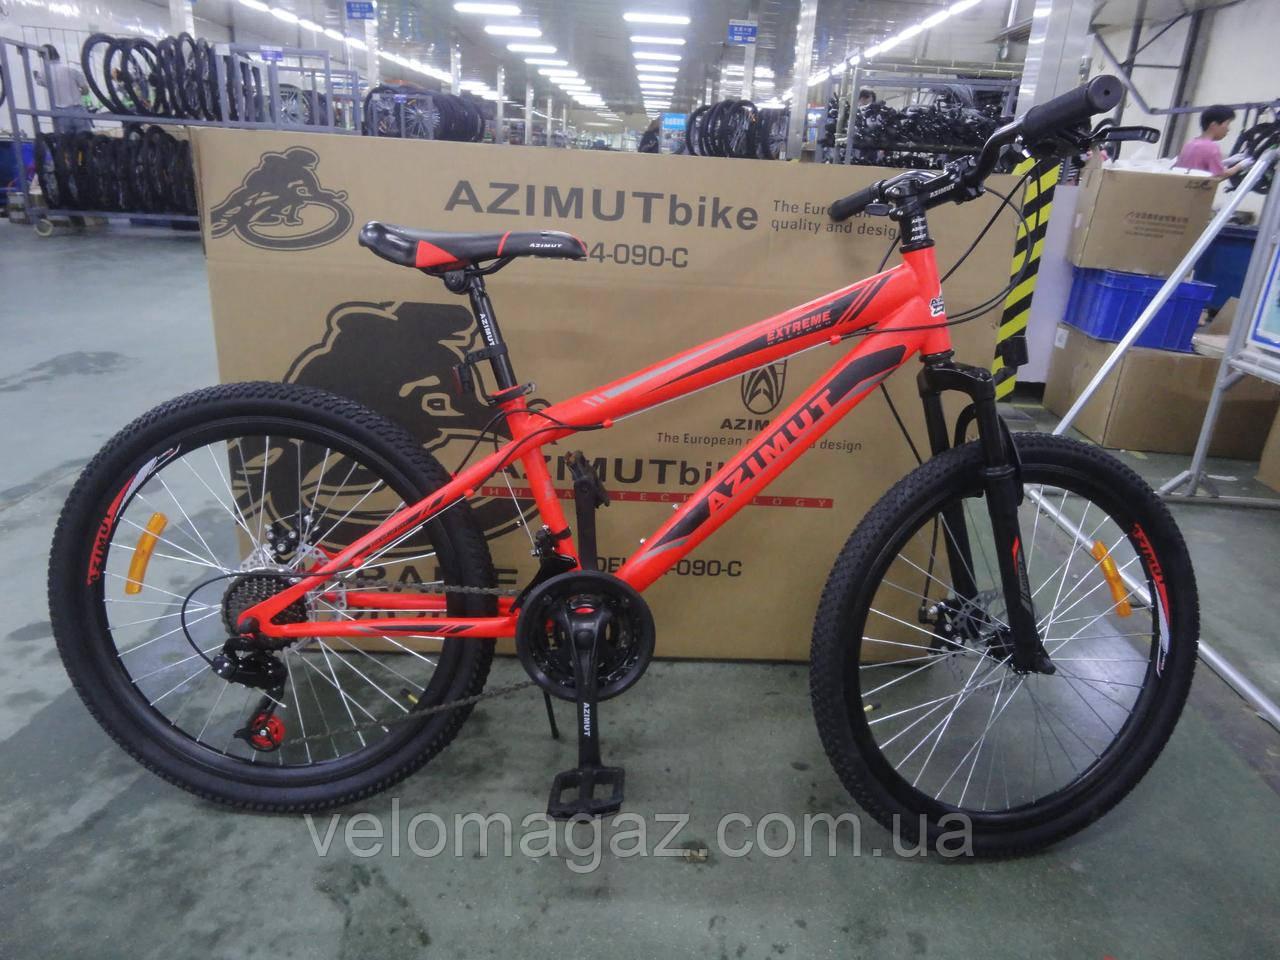 "Велосипед горный Extreme Azimut FRD колеса 24"", стальная рама 13"""